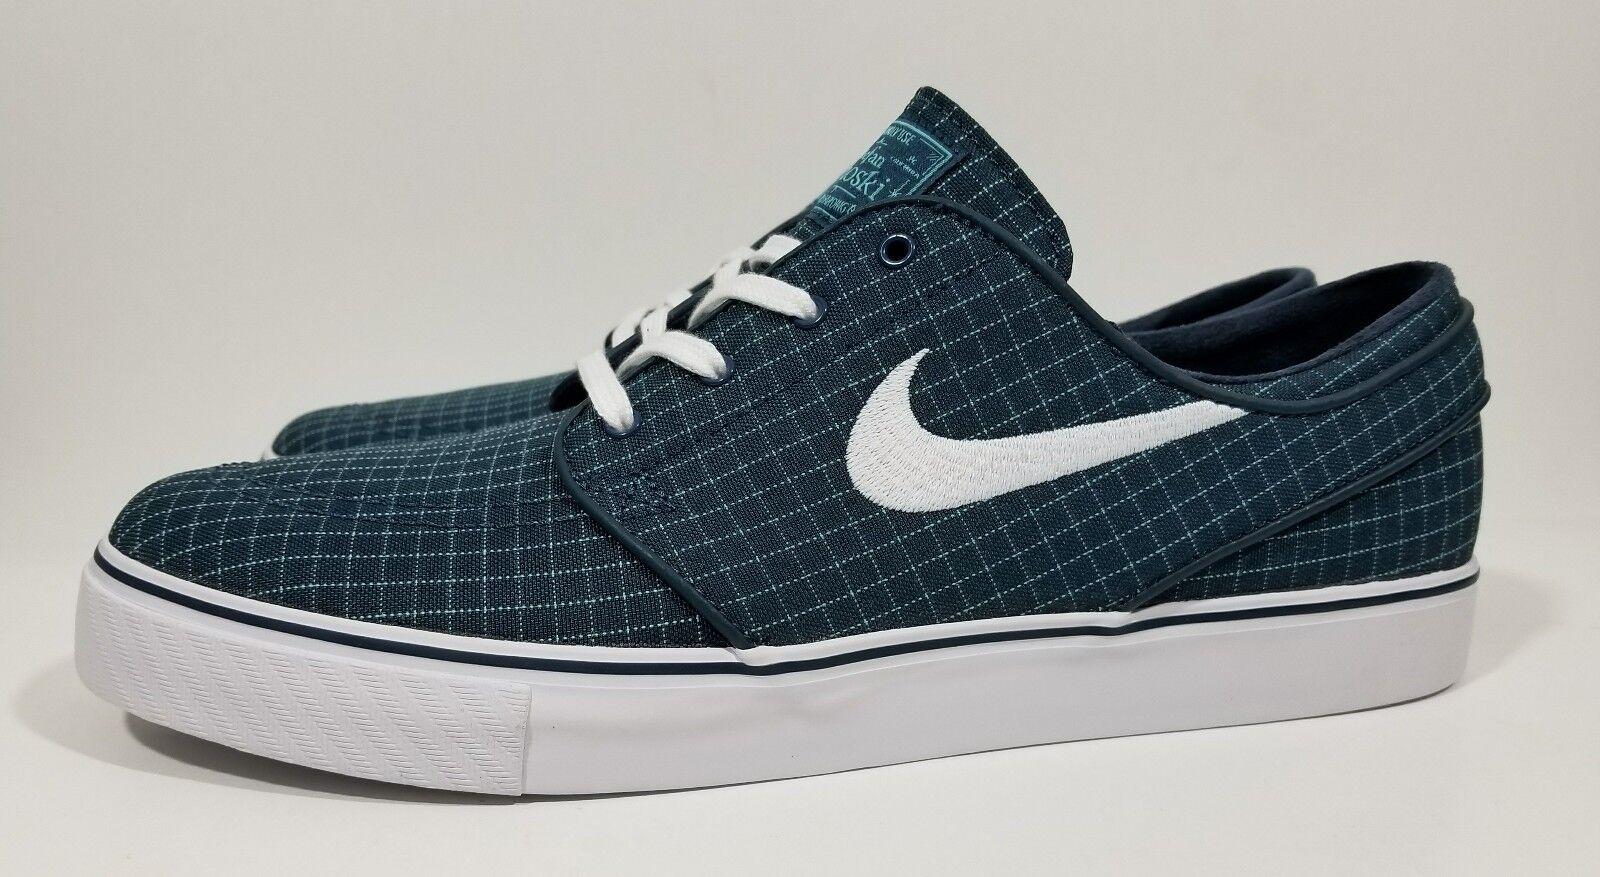 Nike SB Zoom Stefan Janoski Canvas Premium Mens shoes bluee White Size 10